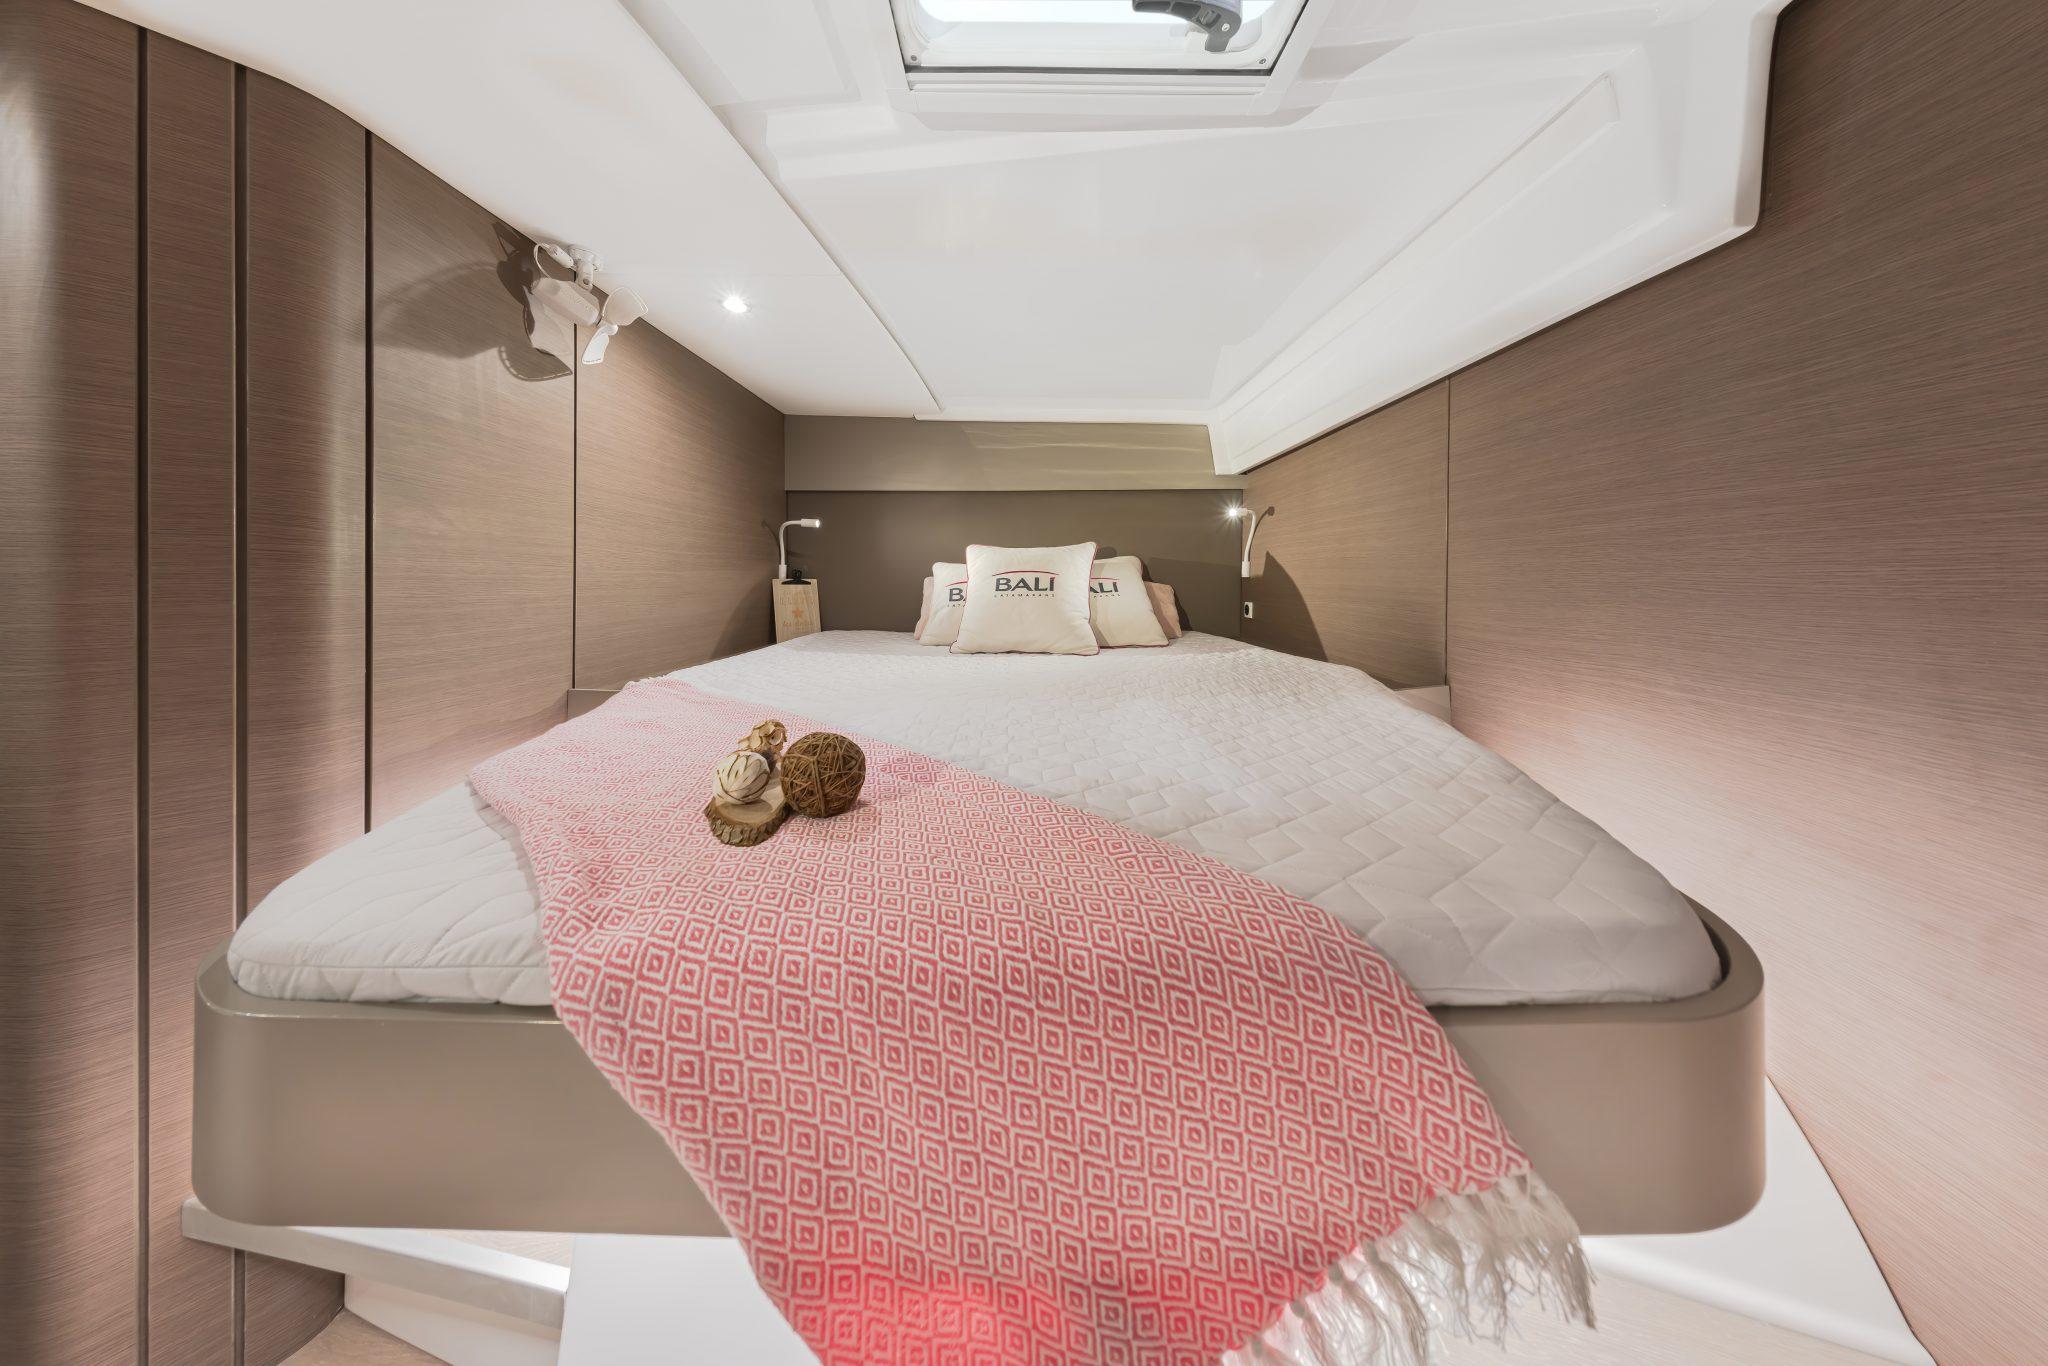 bali-catspace-cabin_2